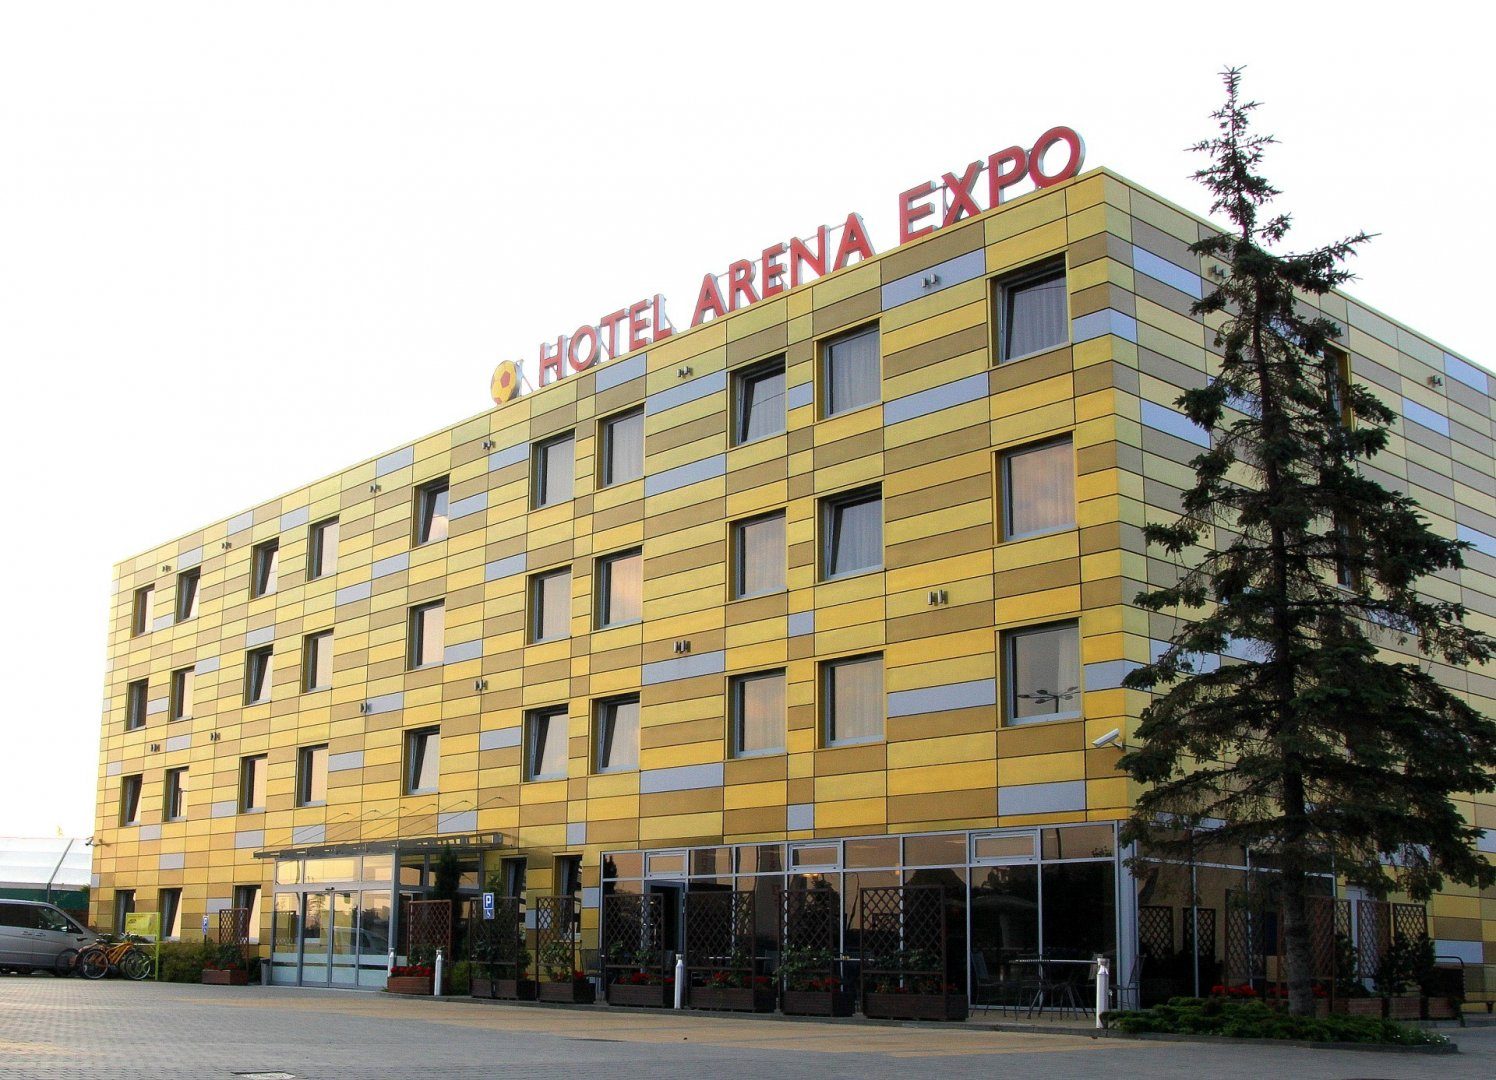 Arena Expo Hotel